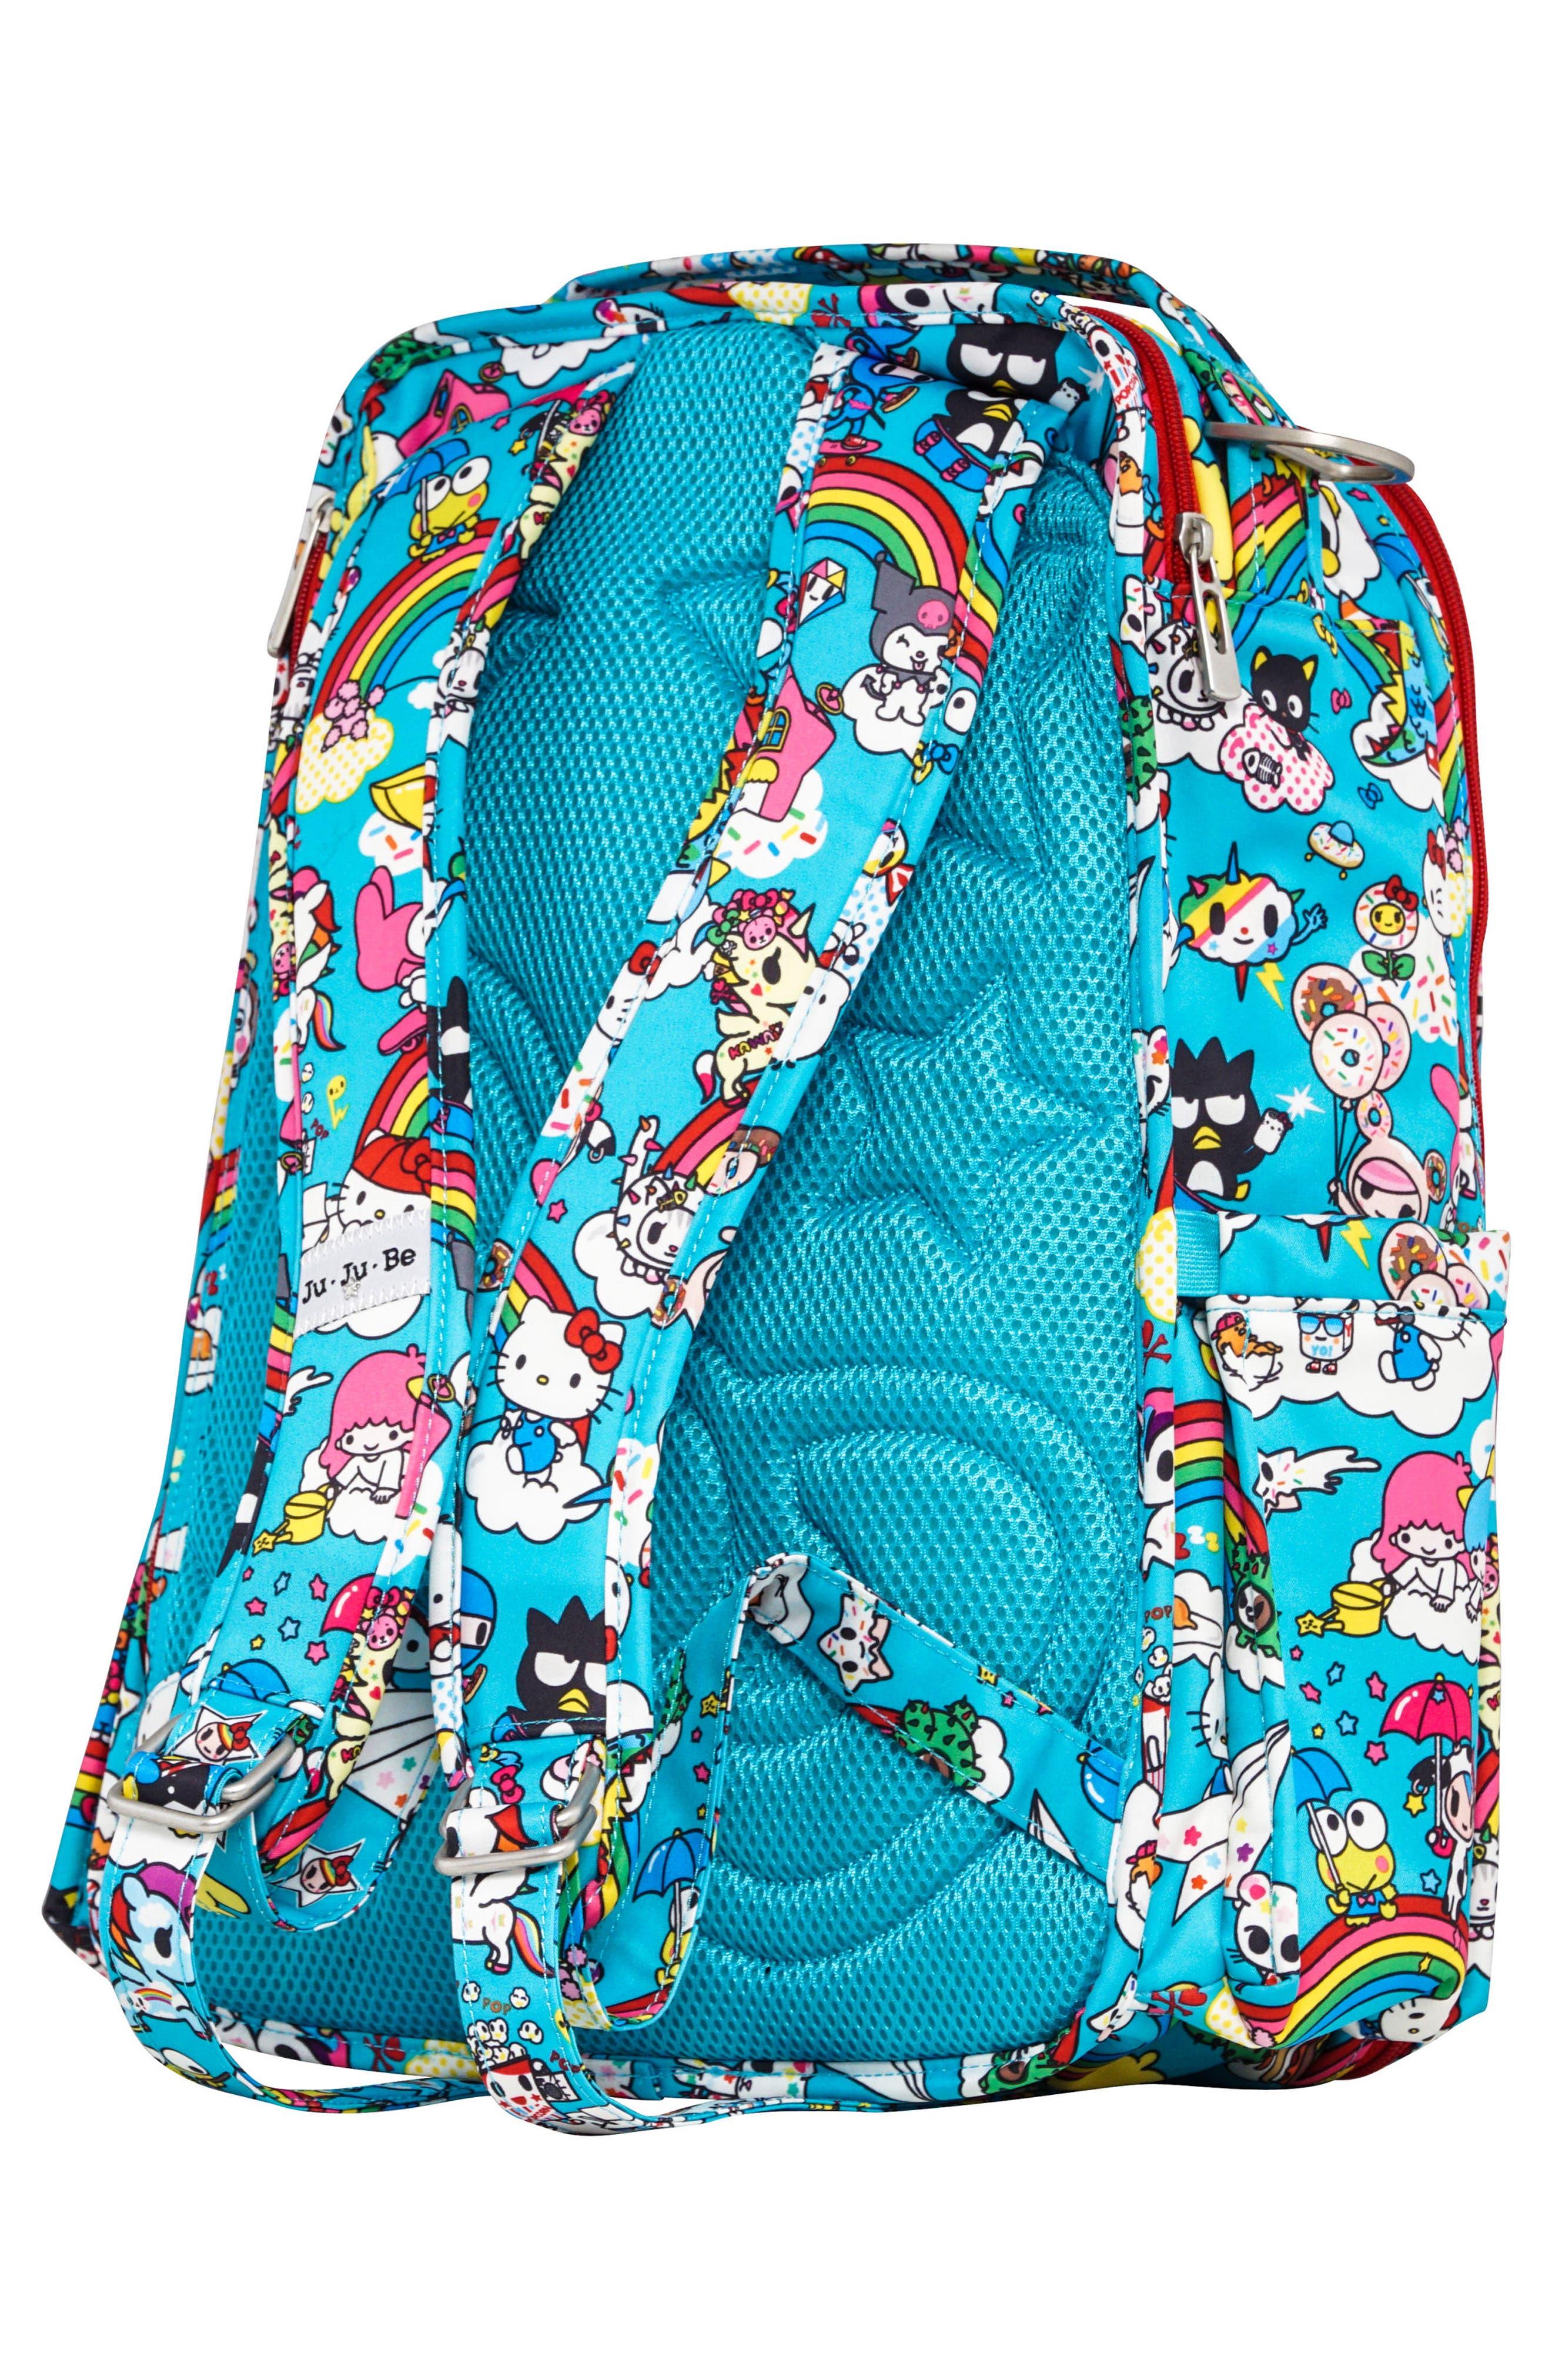 x tokidoki for Hello Sanrio Rainbow Dreams Be Mini Backpack,                             Alternate thumbnail 2, color,                             433